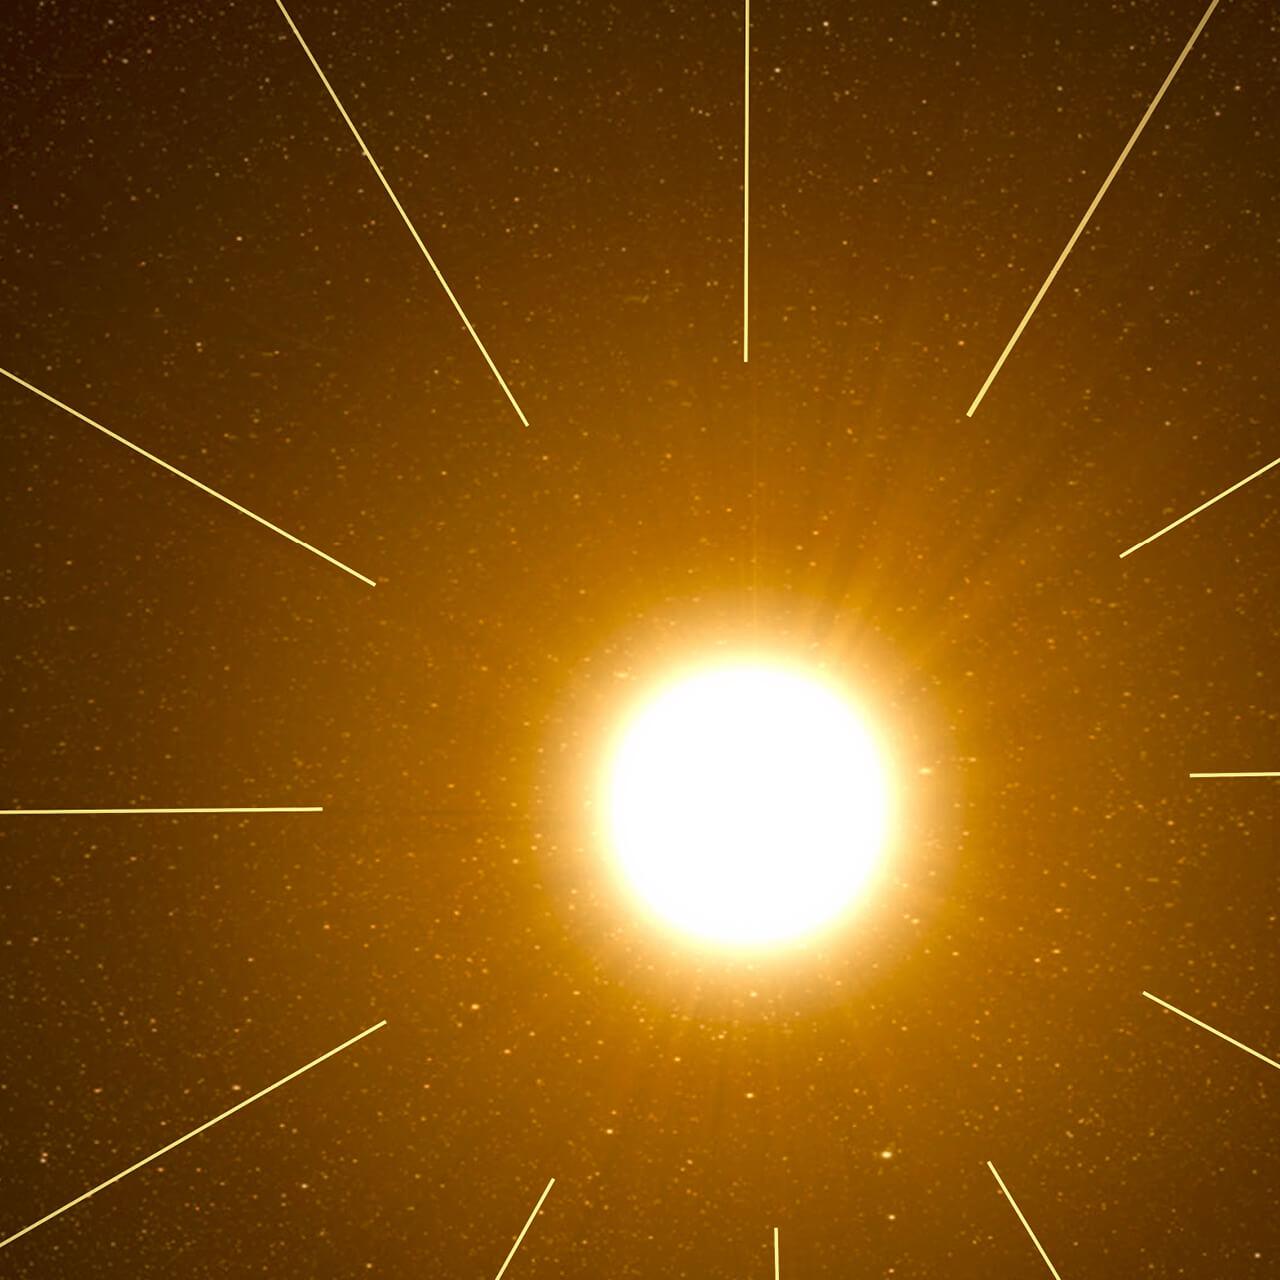 solarcalendar-2016-detail-r2-3